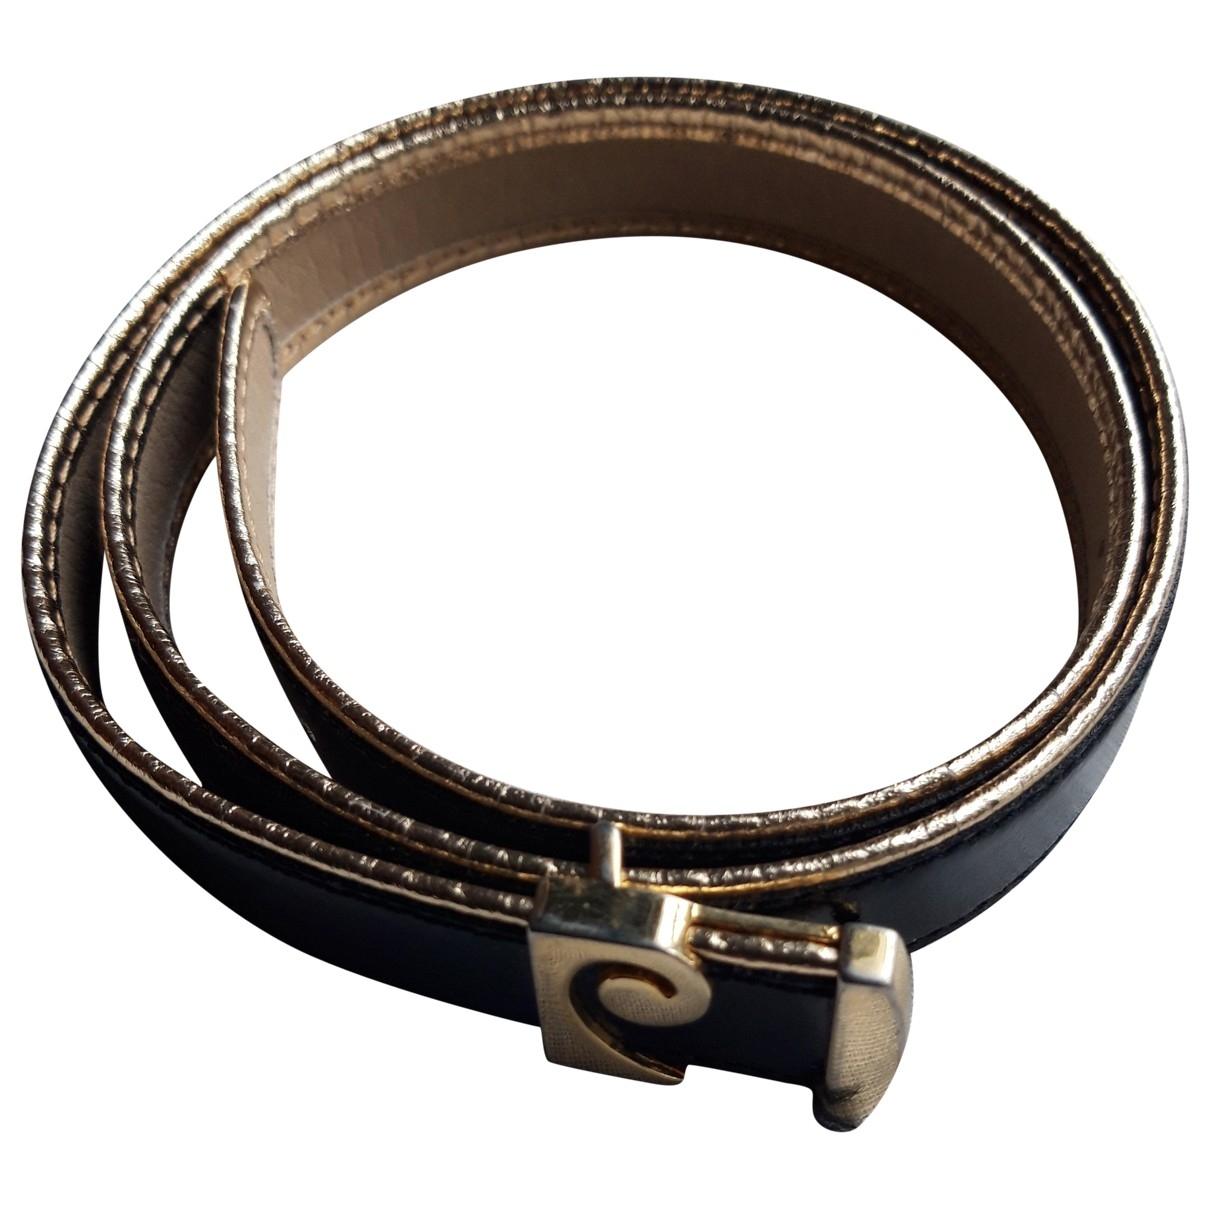 Cinturon de Cuero Pierre Cardin